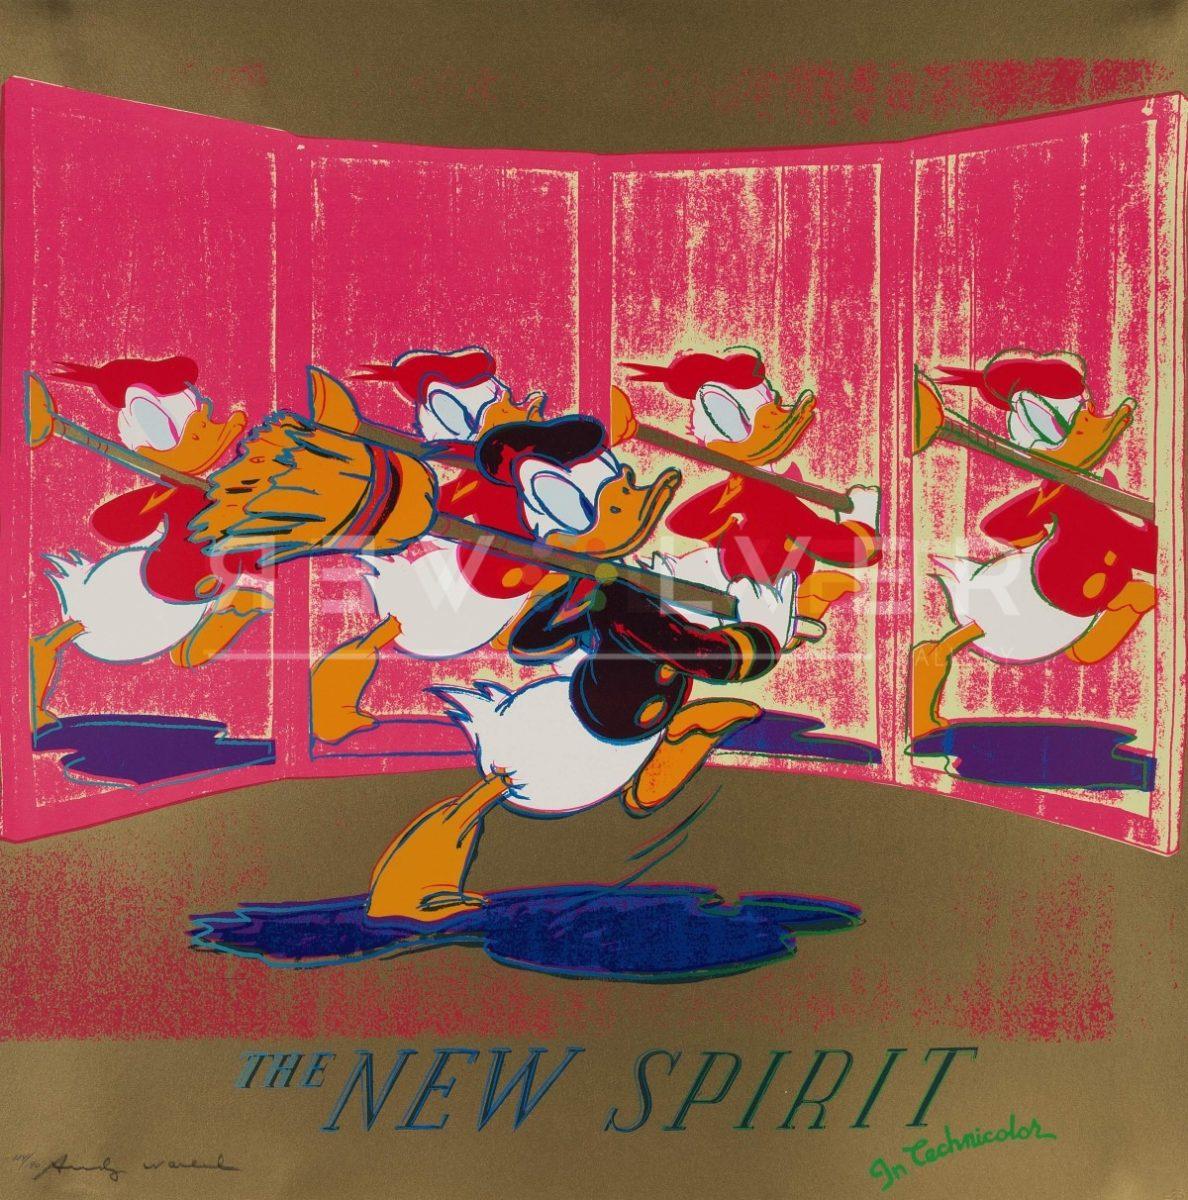 Andy Warhol - The New spirit F.S. II 357 jpg